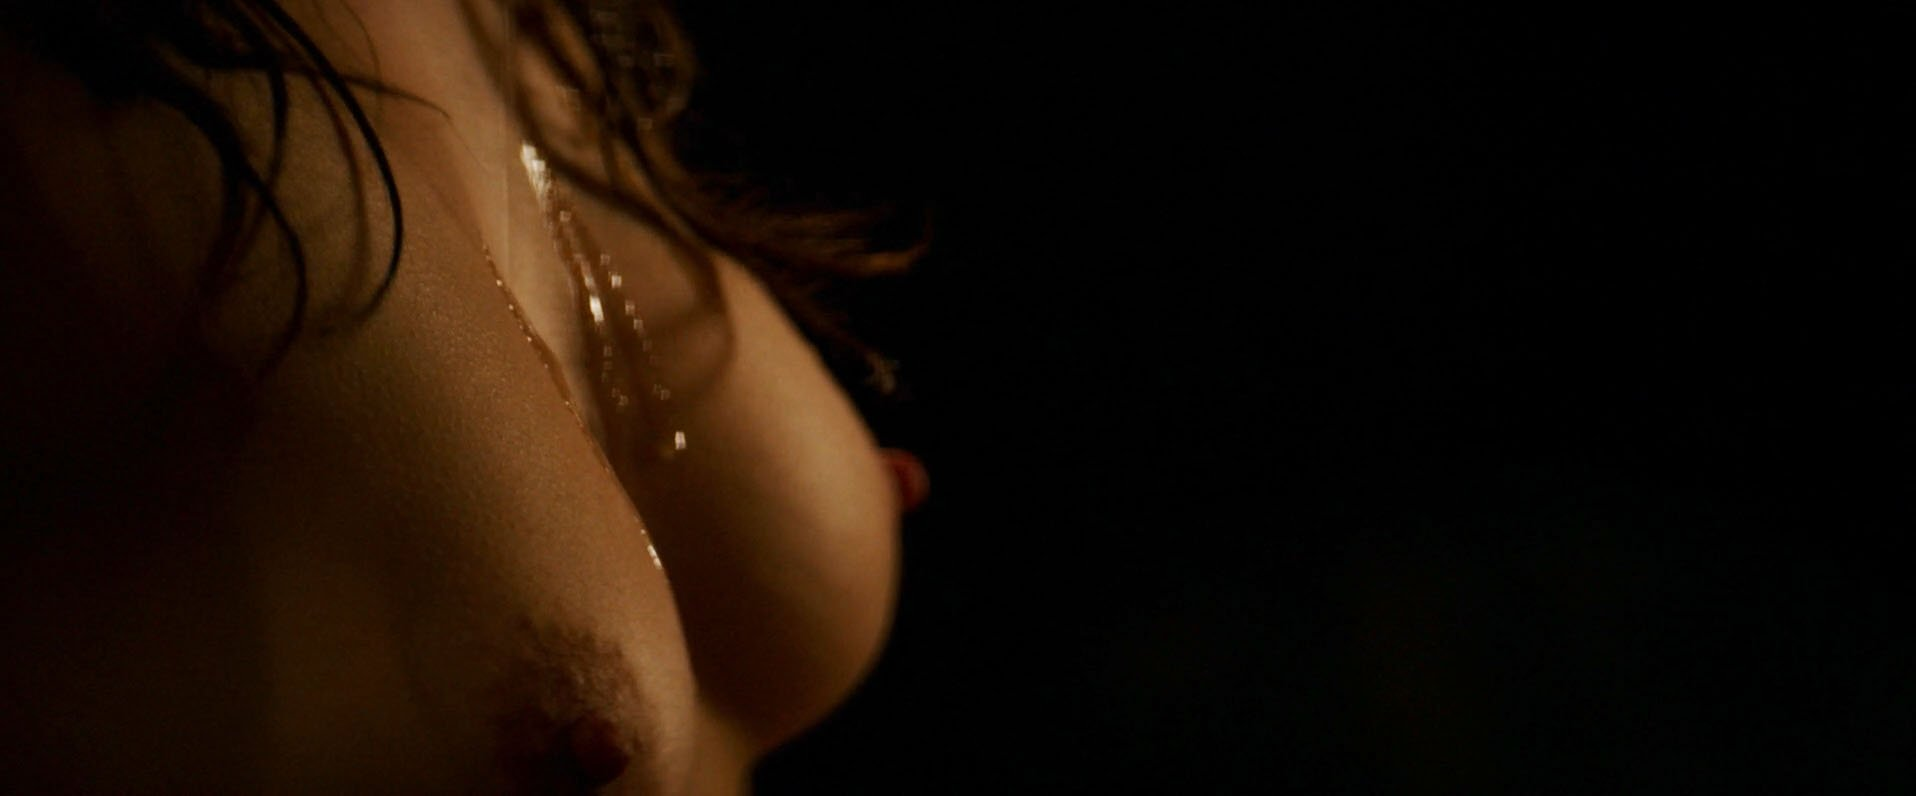 Dakota Johnson nude - Fifty Shades Darker (2017)